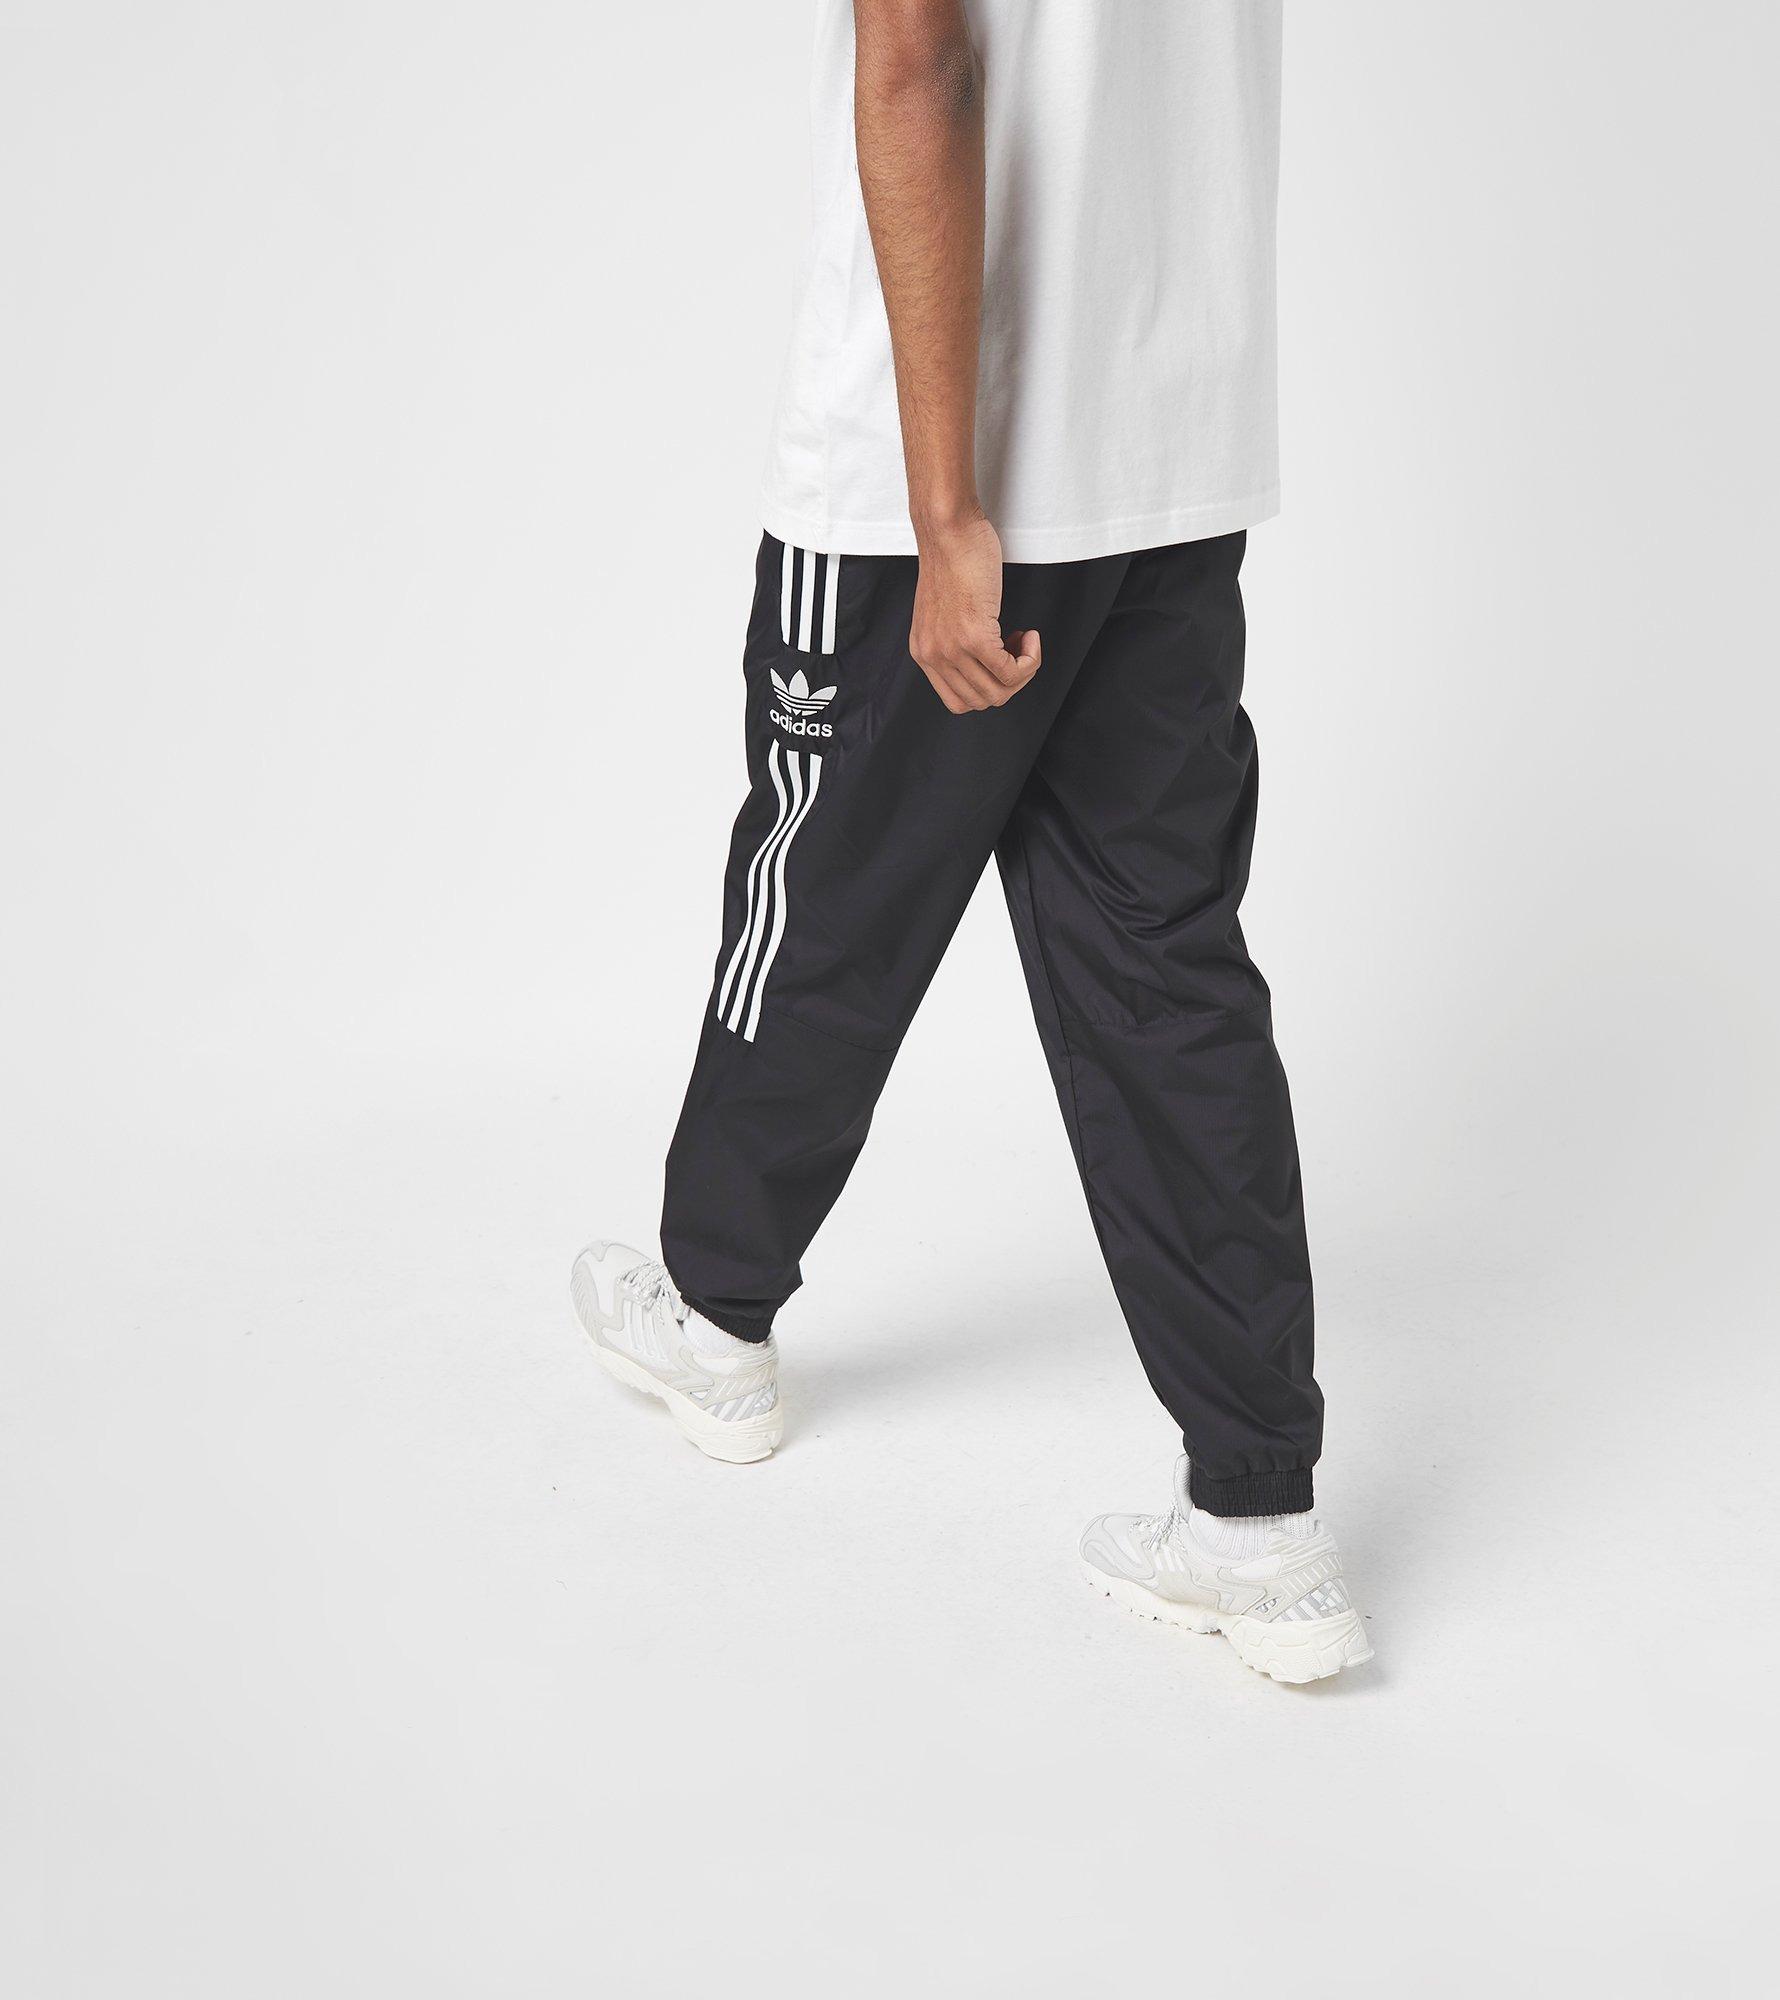 adidas pantalon lock up